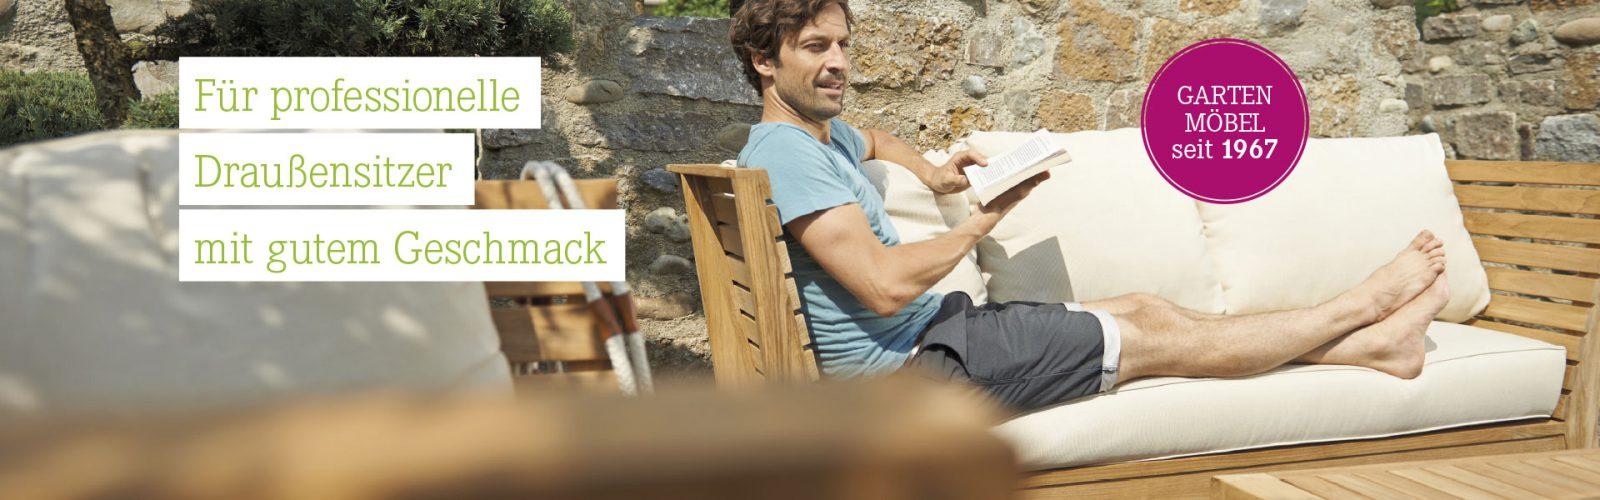 Acamp gartenm bel hochwertig langlebig elegantes design for Gartenmobel hochwertig